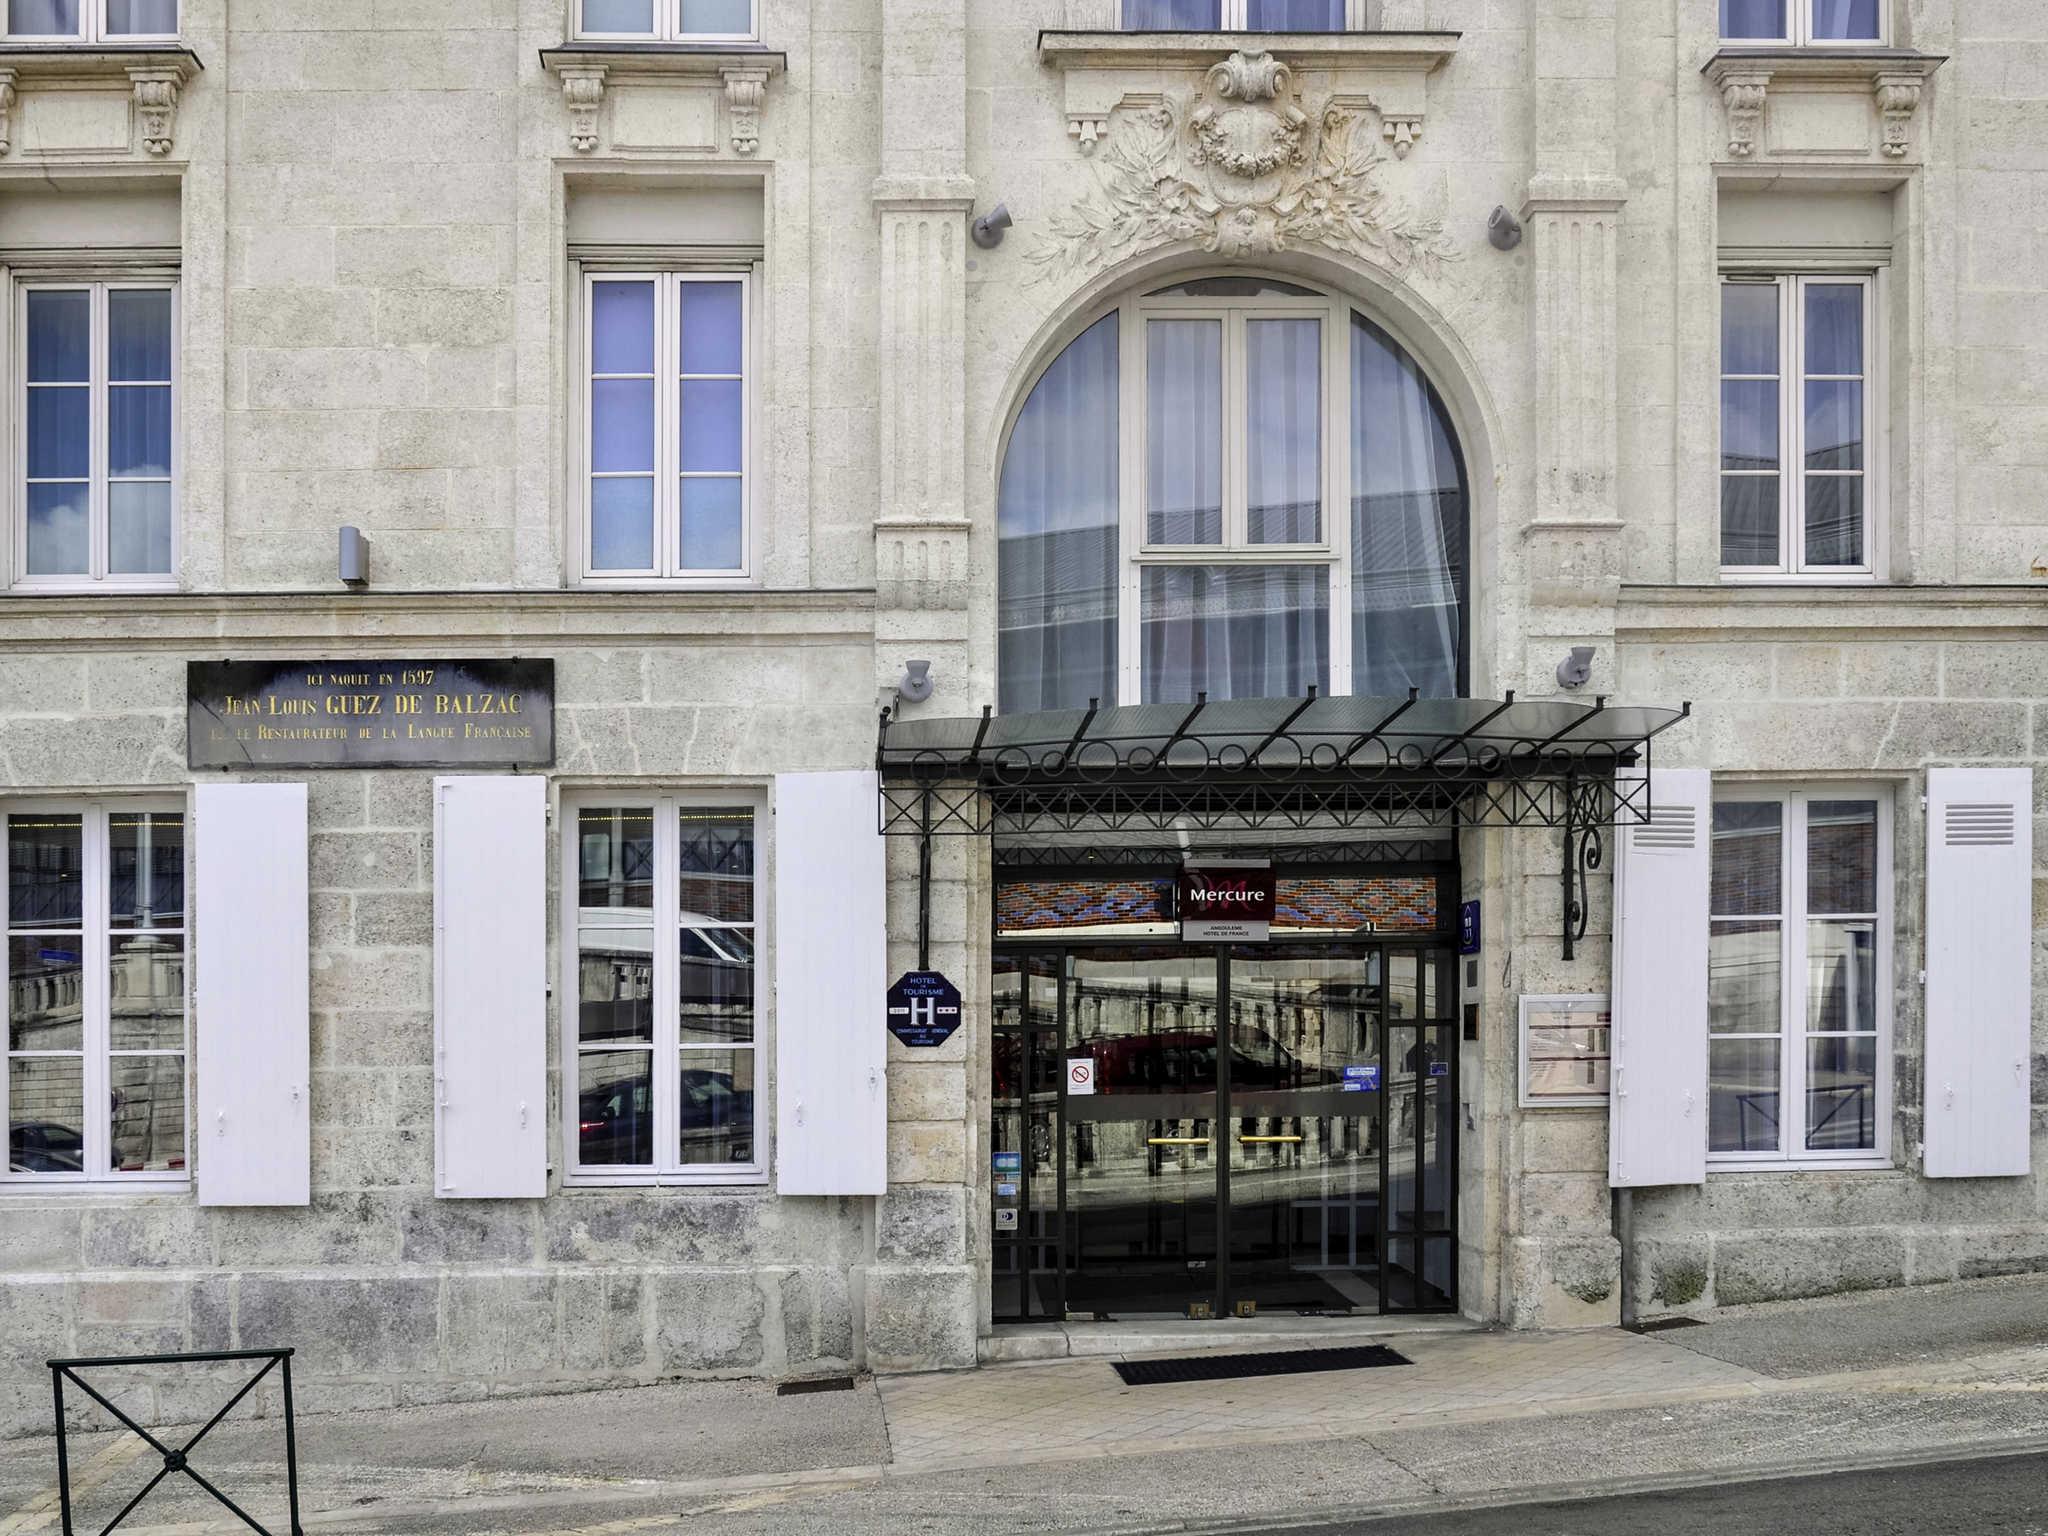 Hotel - Hotel Mercure Angouleme Hotel de France